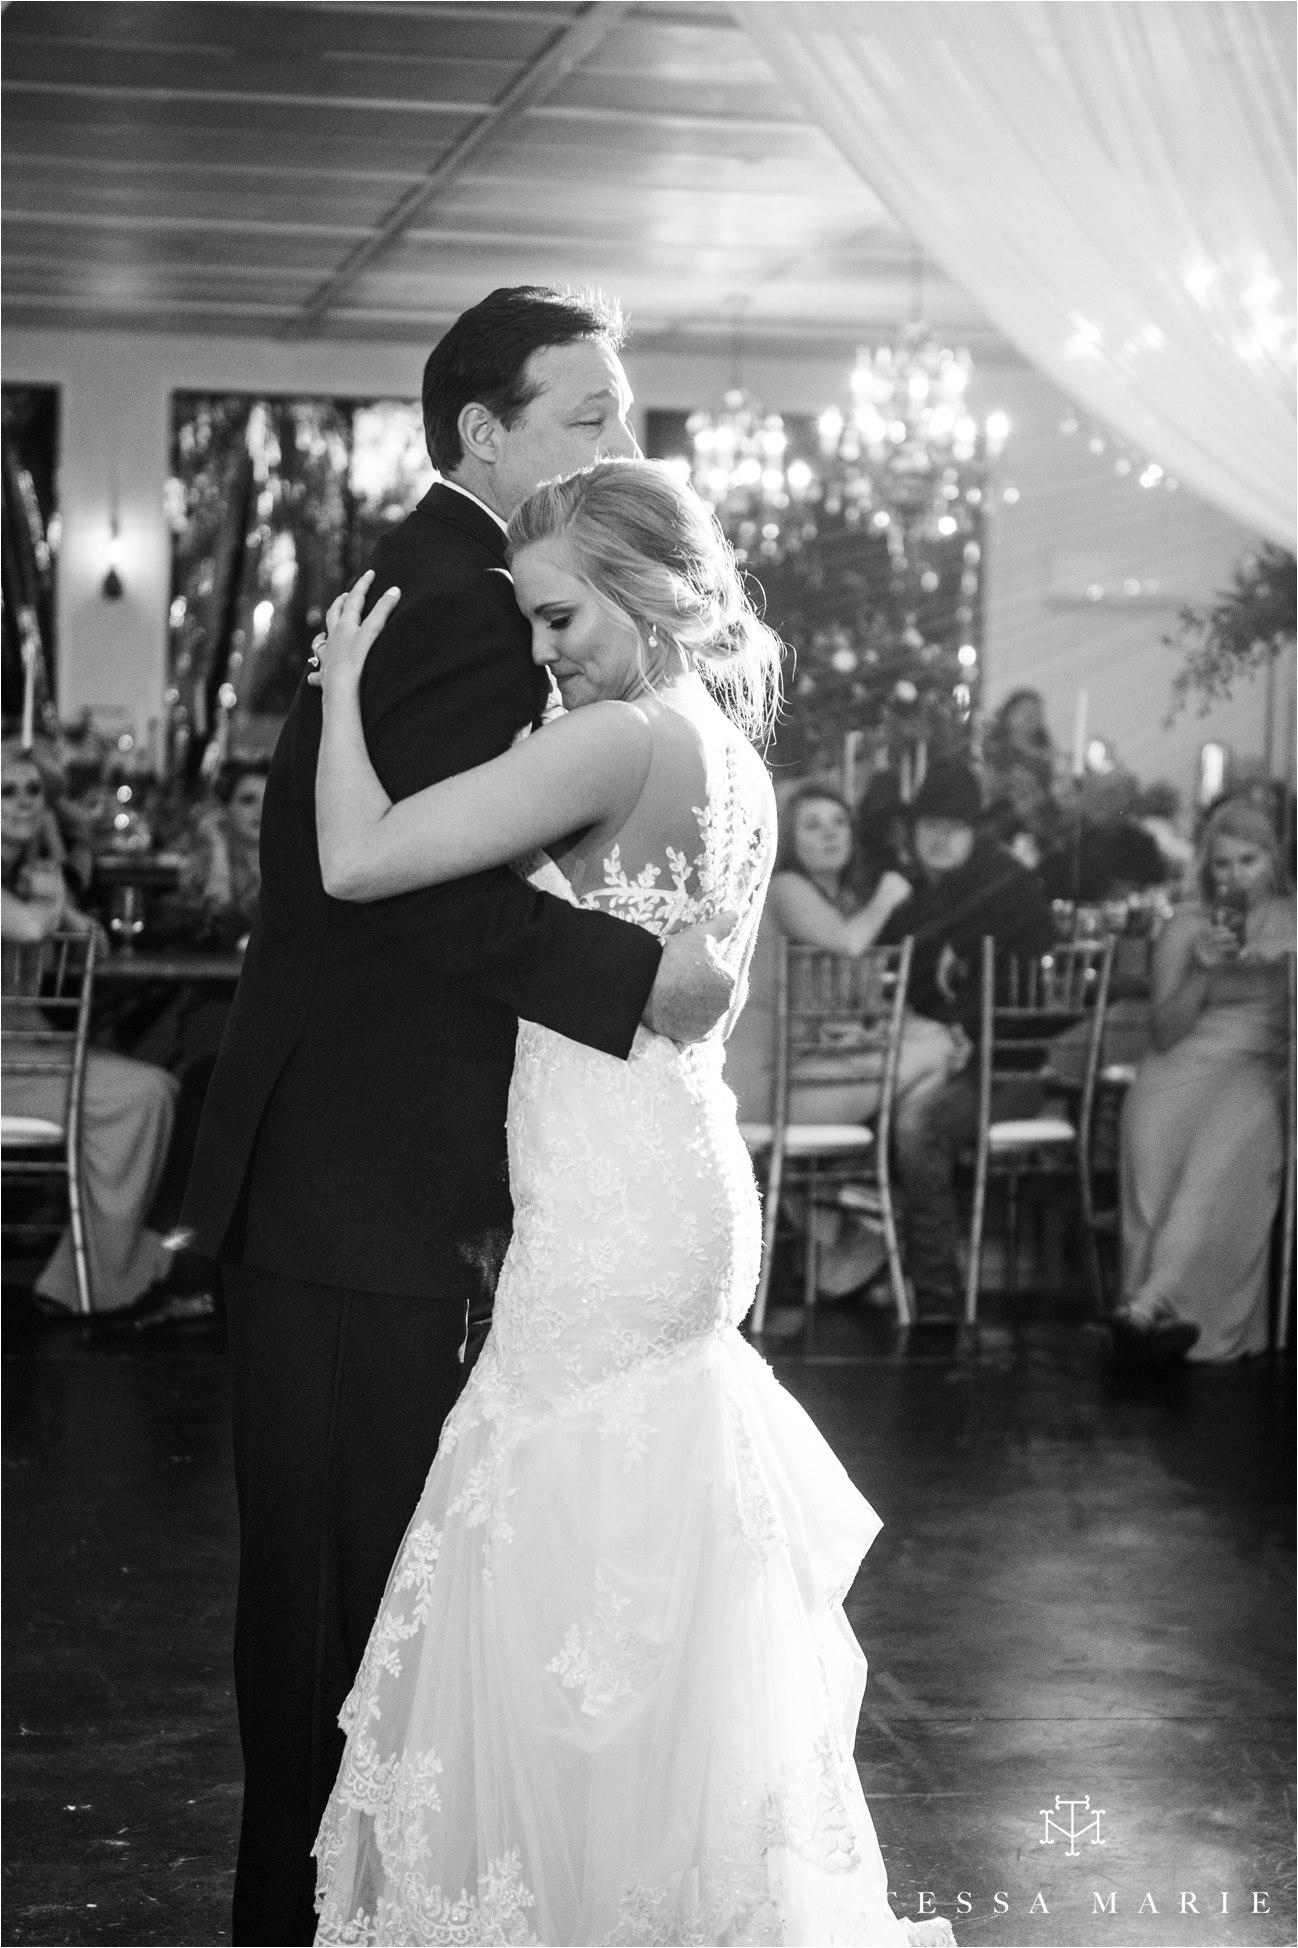 tessa_marie_studios_little_river_Farm_wedding_pictures_tessa_marie_weddings_0897